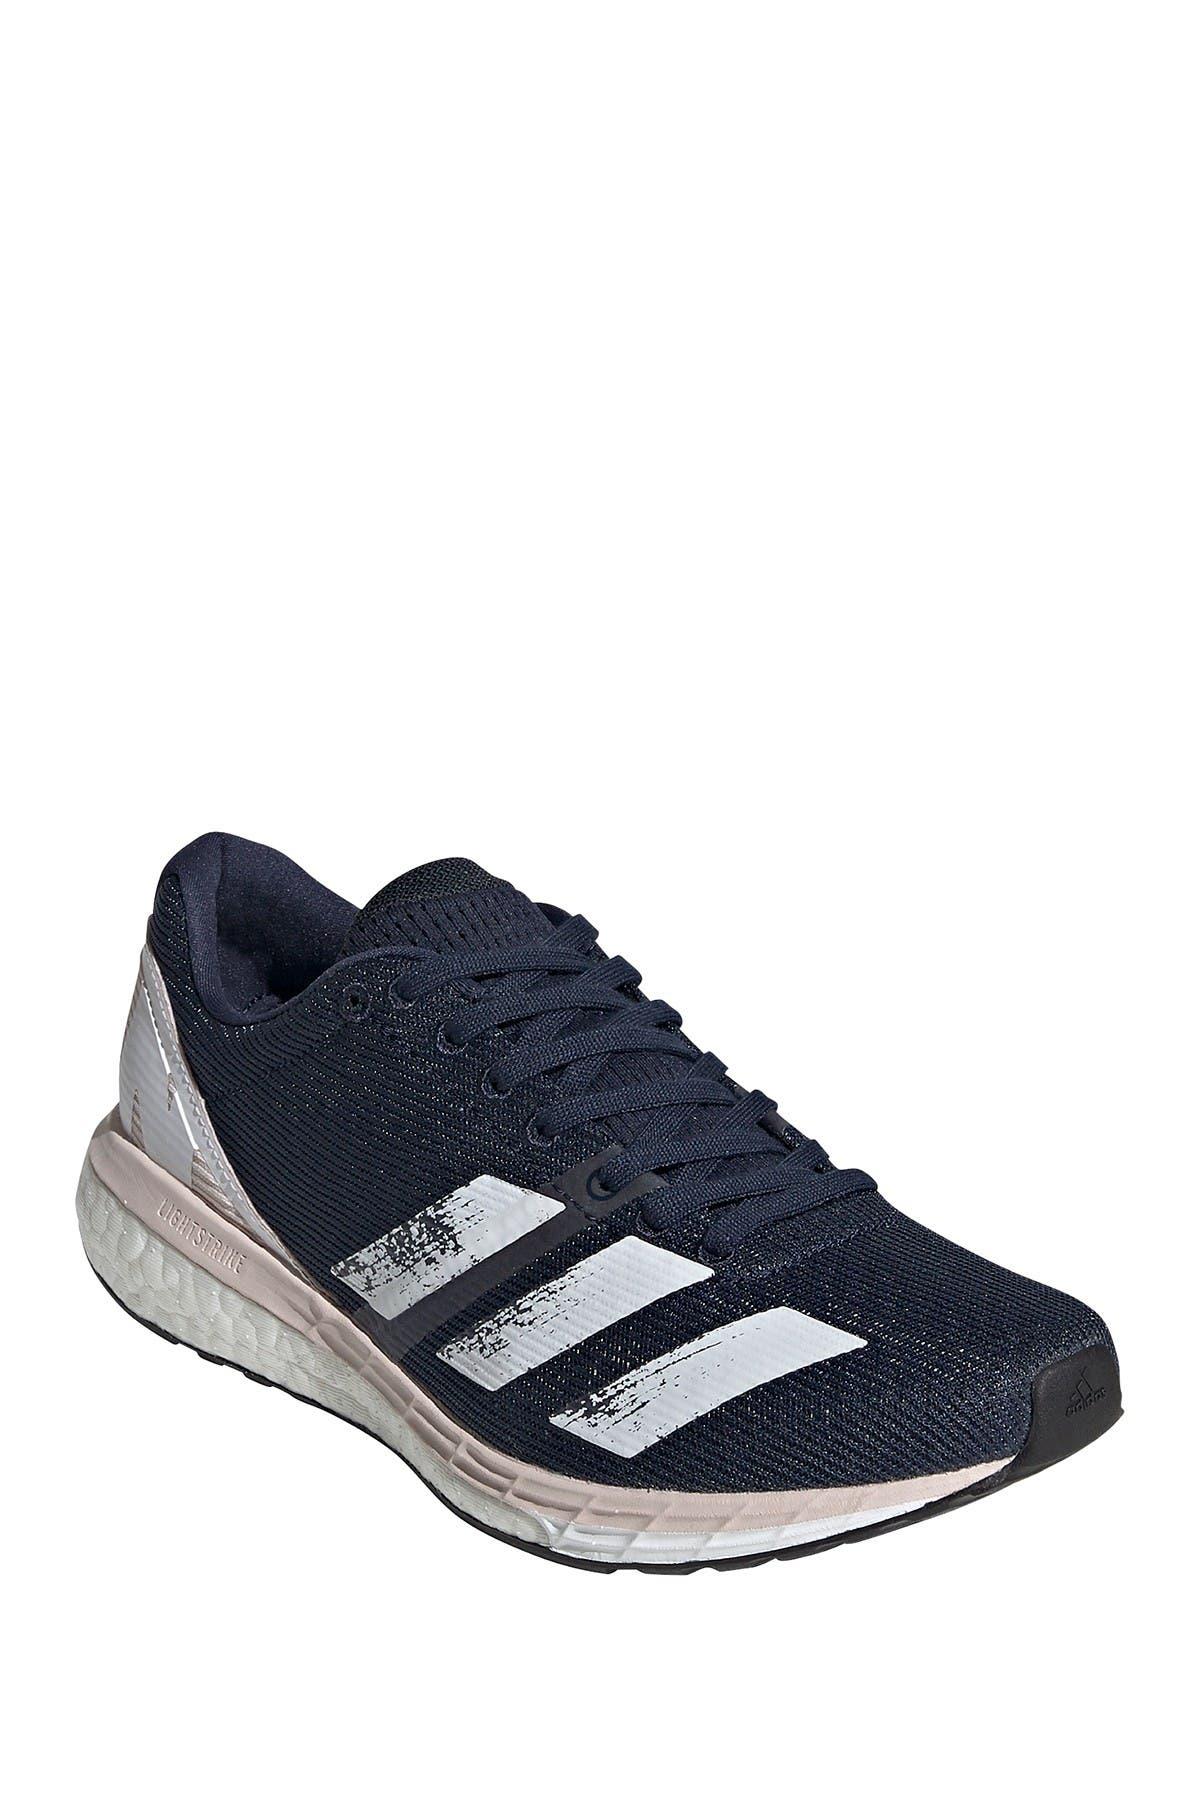 Image of adidas Adizero Boston 8 Sneaker